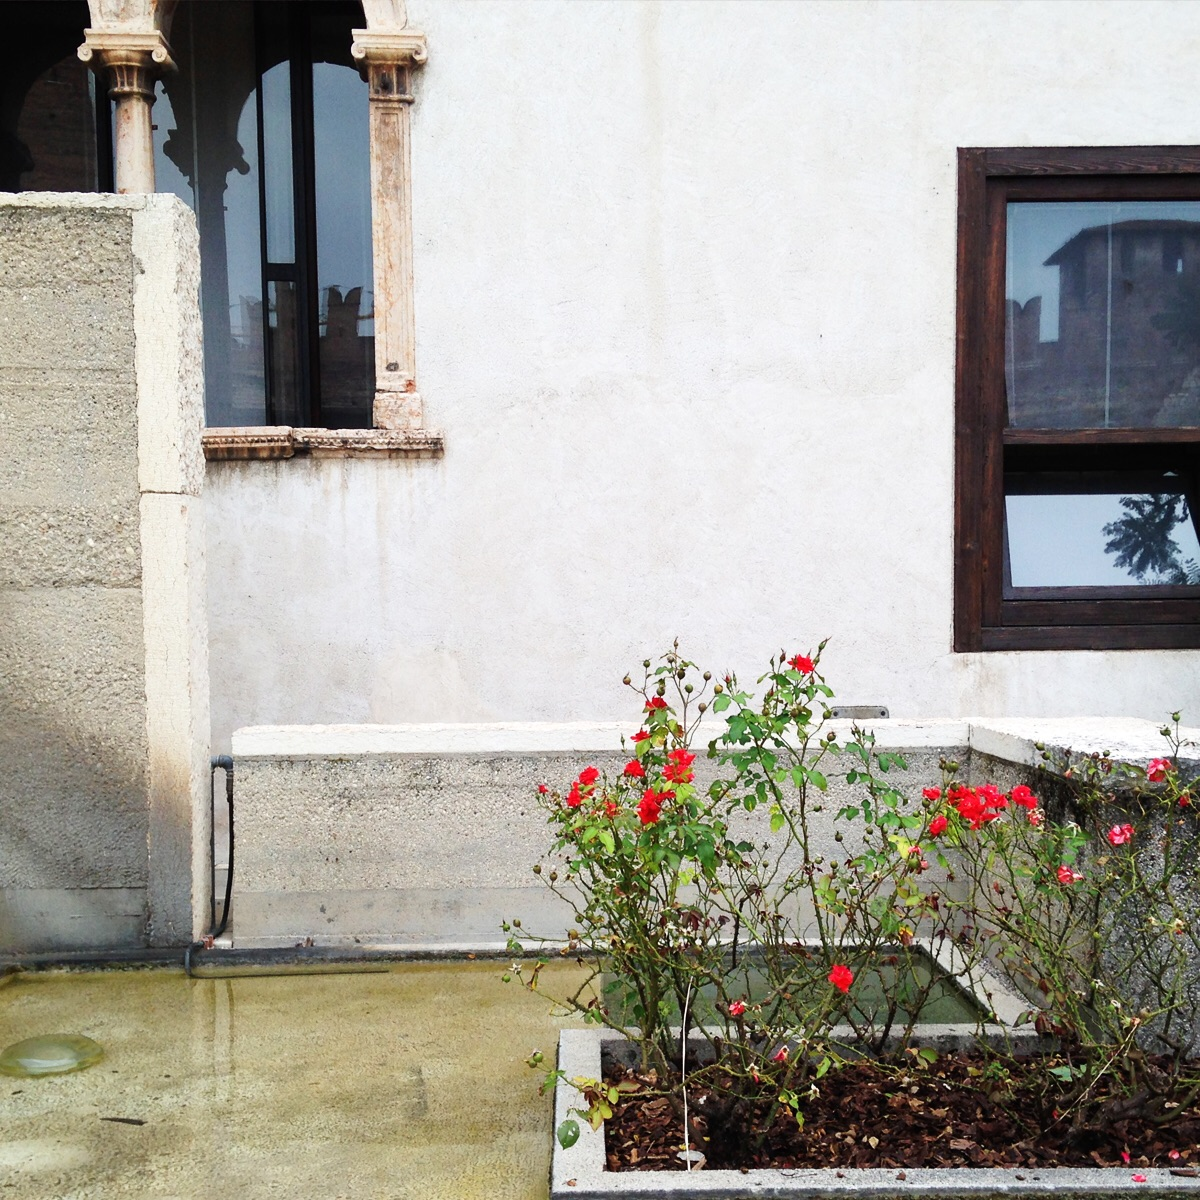 Courtyard . castelvecchio museum, Verona. (Scarpa, restored 1973)